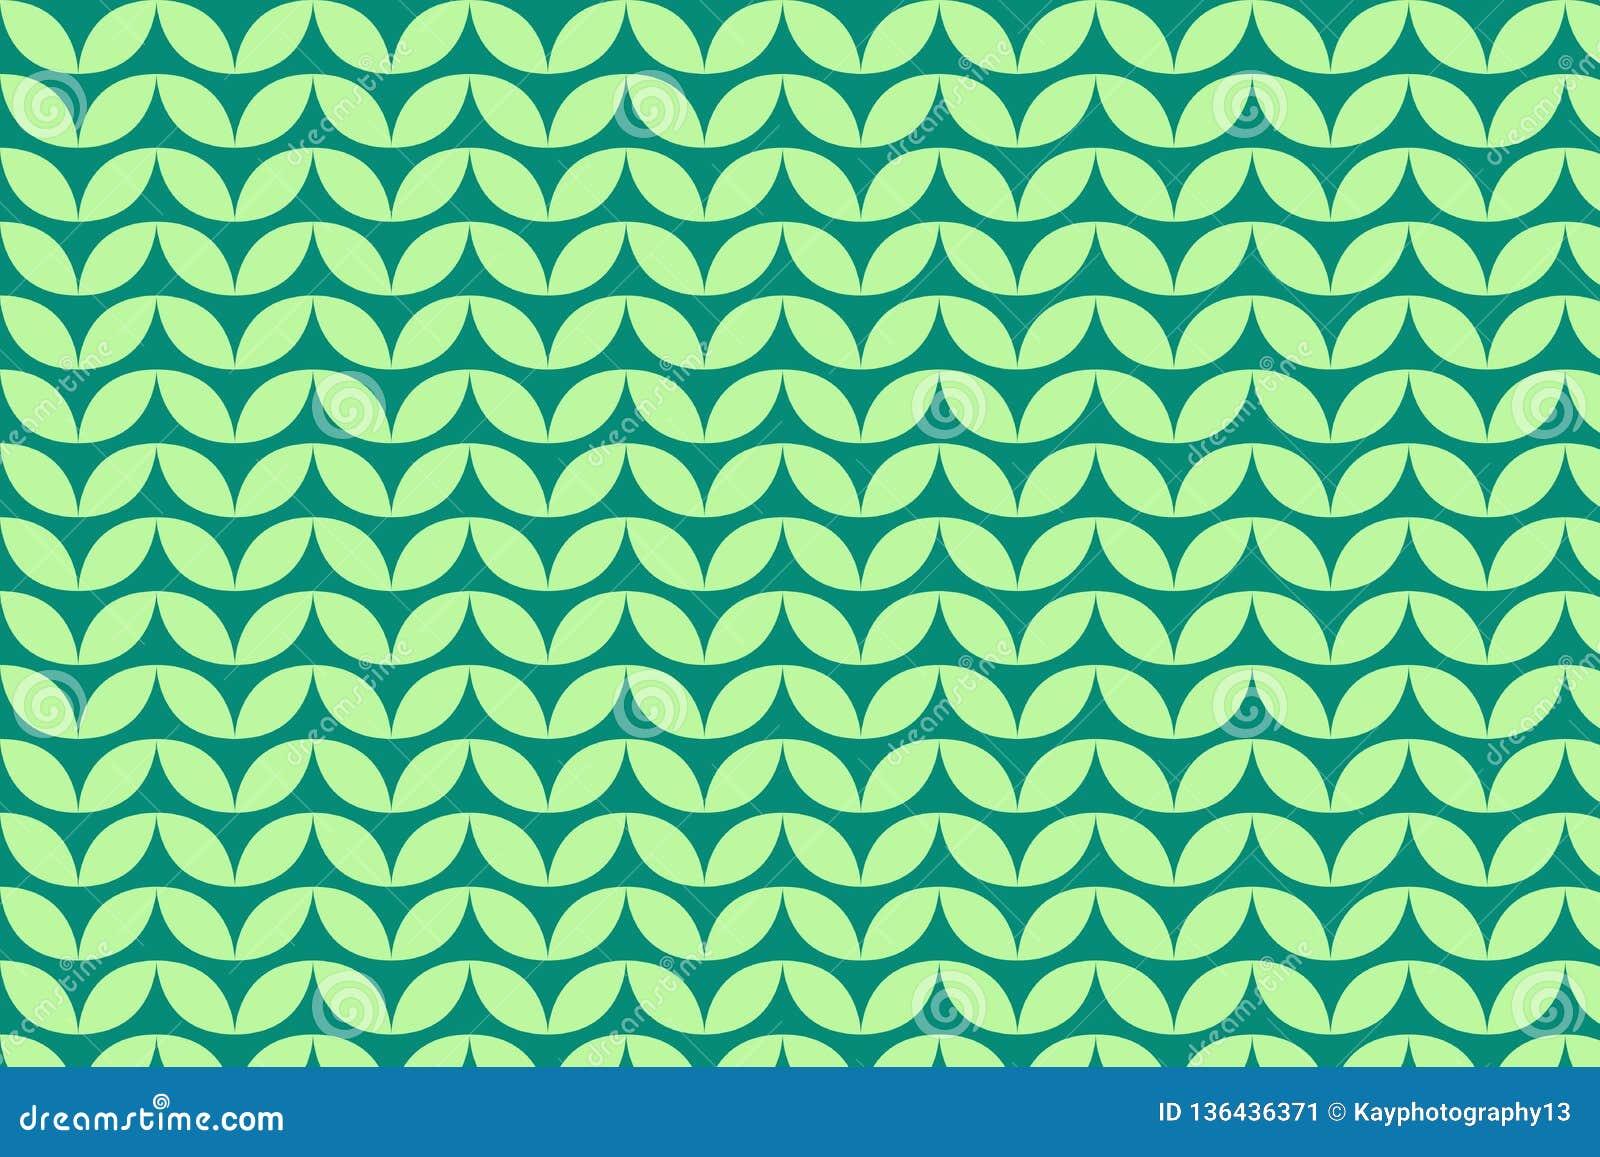 Green Floral Patterns On Dark Green Background Stock